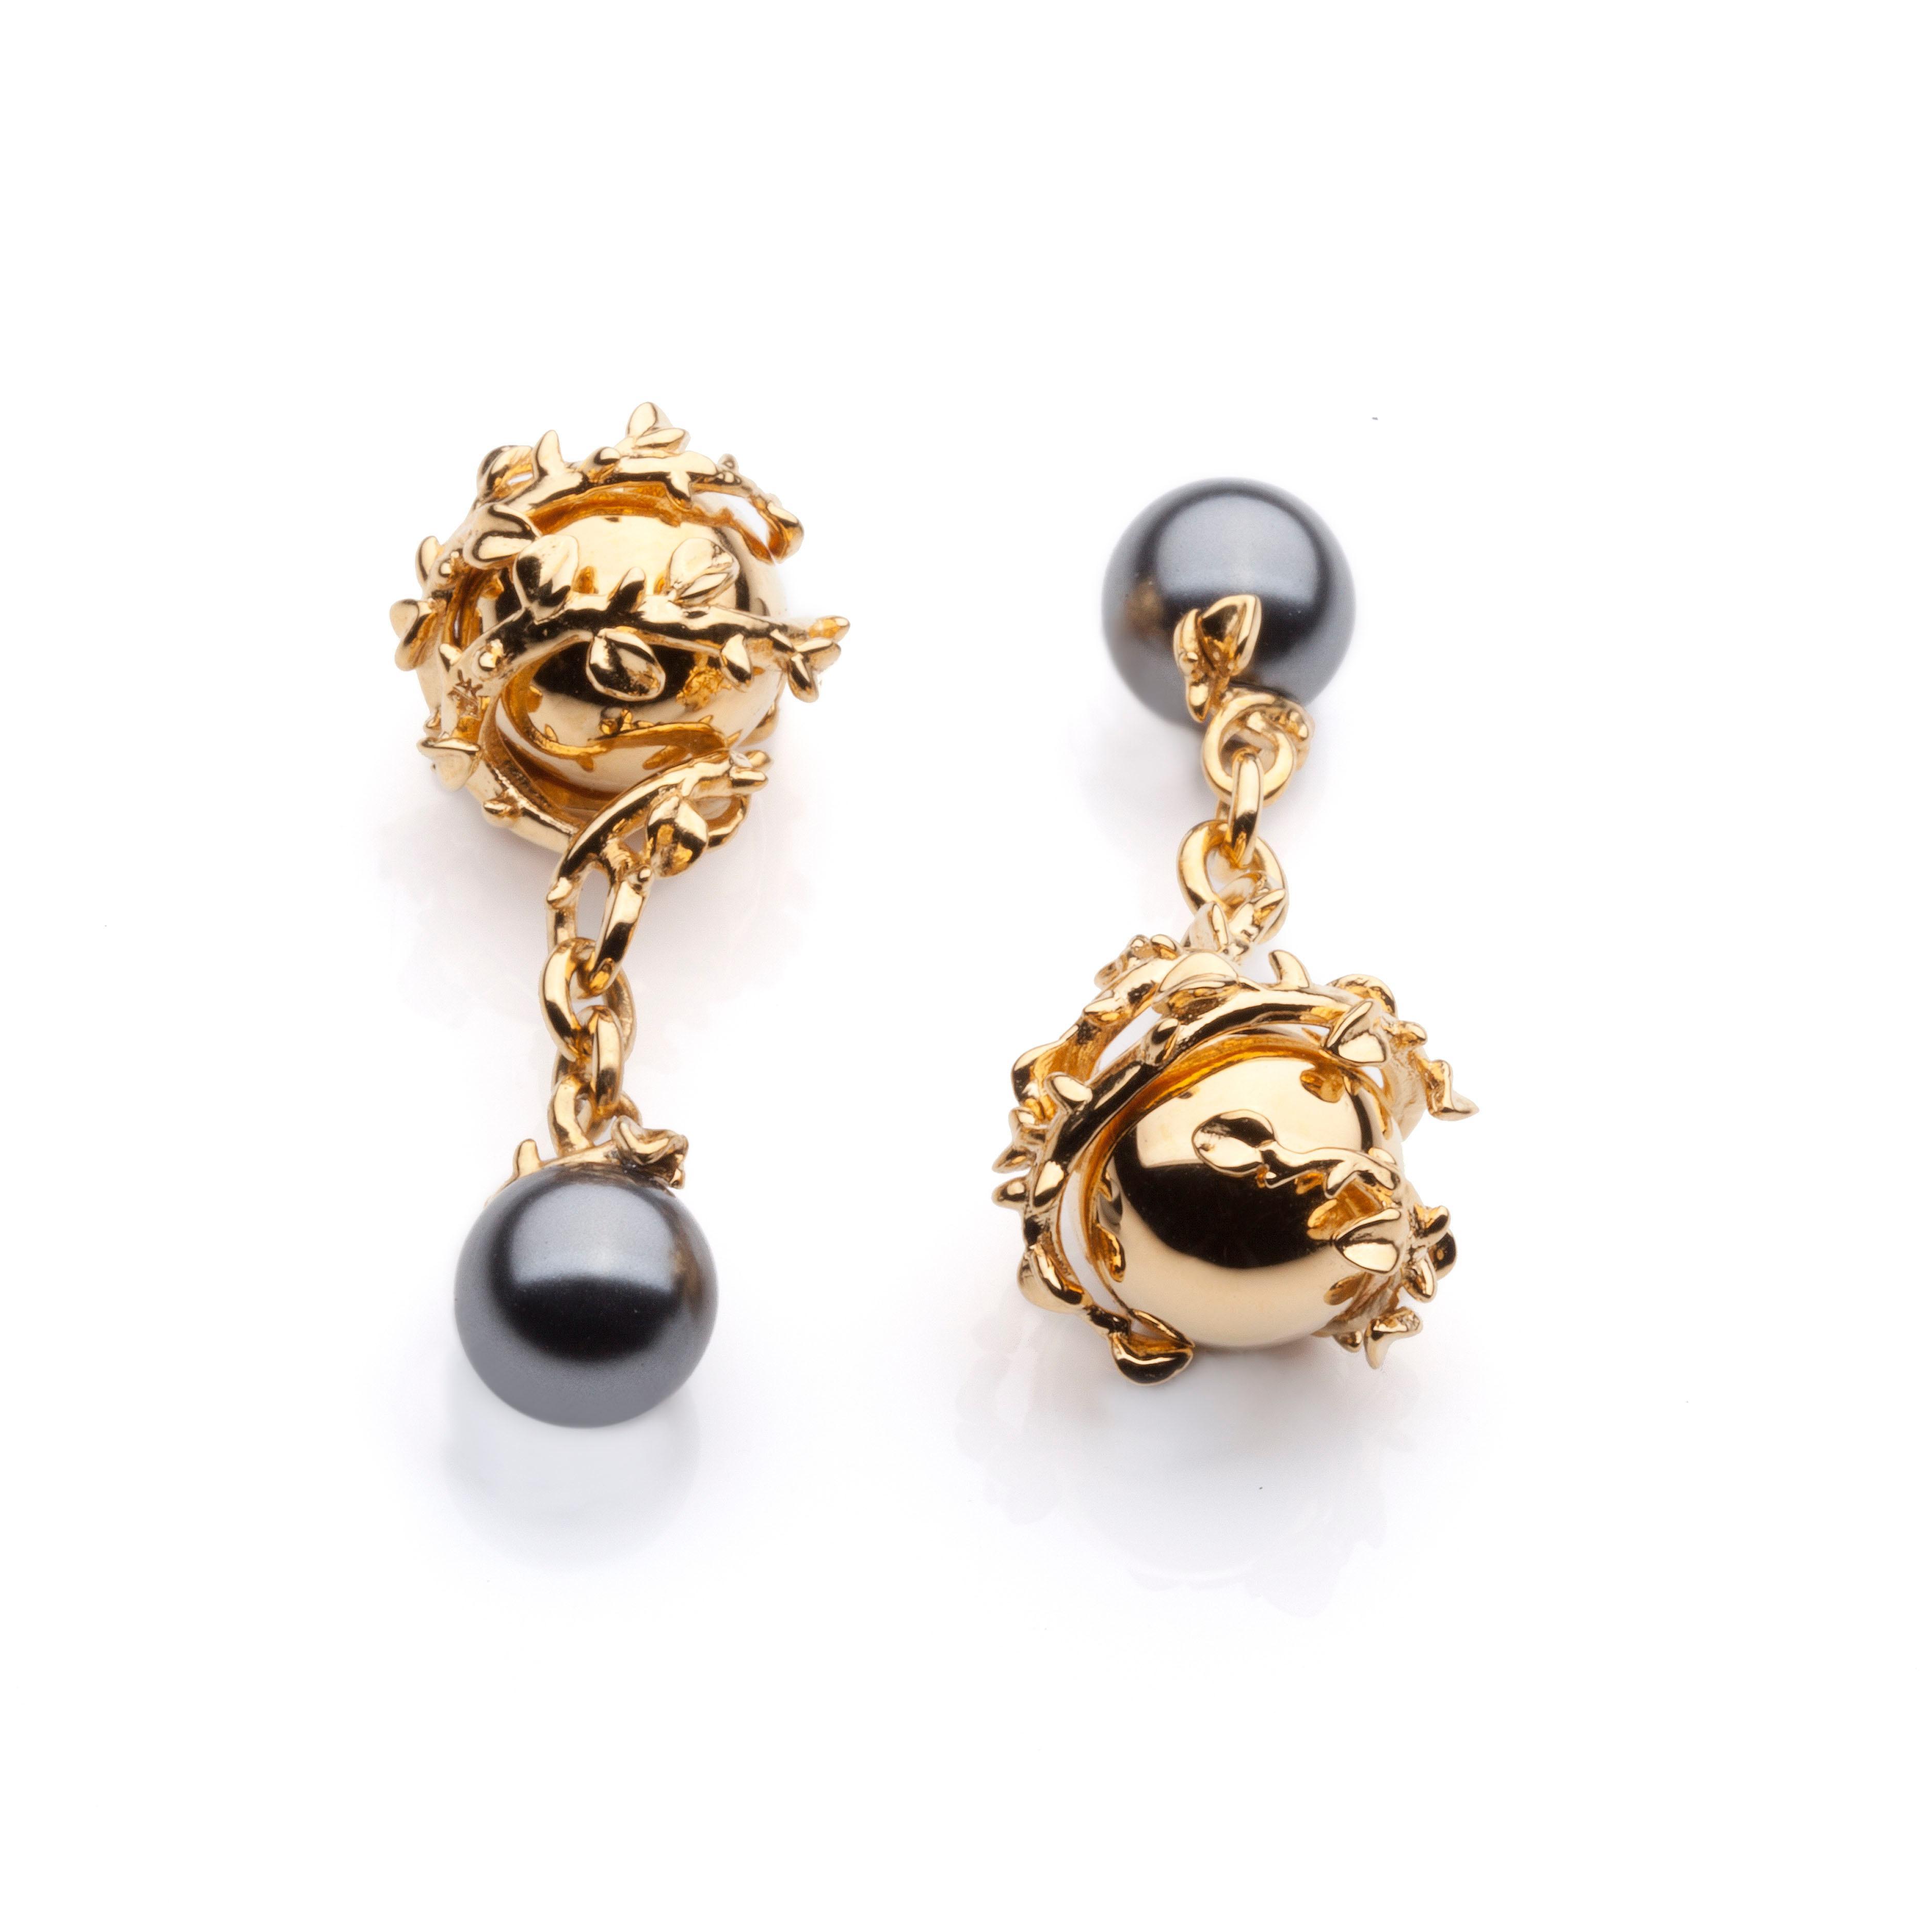 Kasun London Orb and pearl cufflinks - Metallic IV1Wjtuj